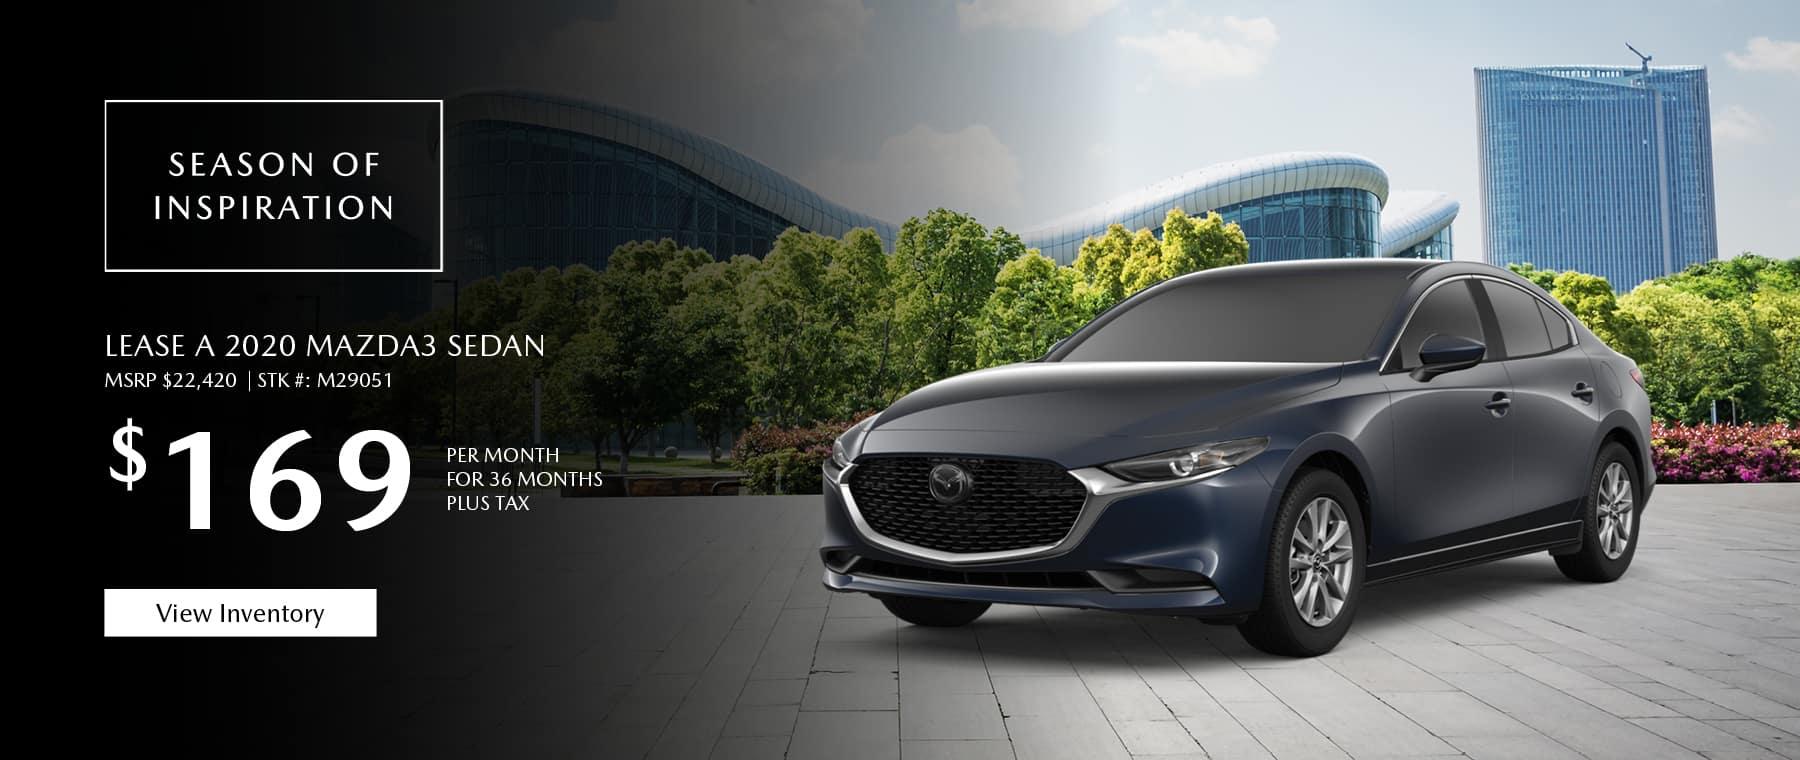 Lease the 2020 Mazda3 sedan for $169 per month, plus tax.